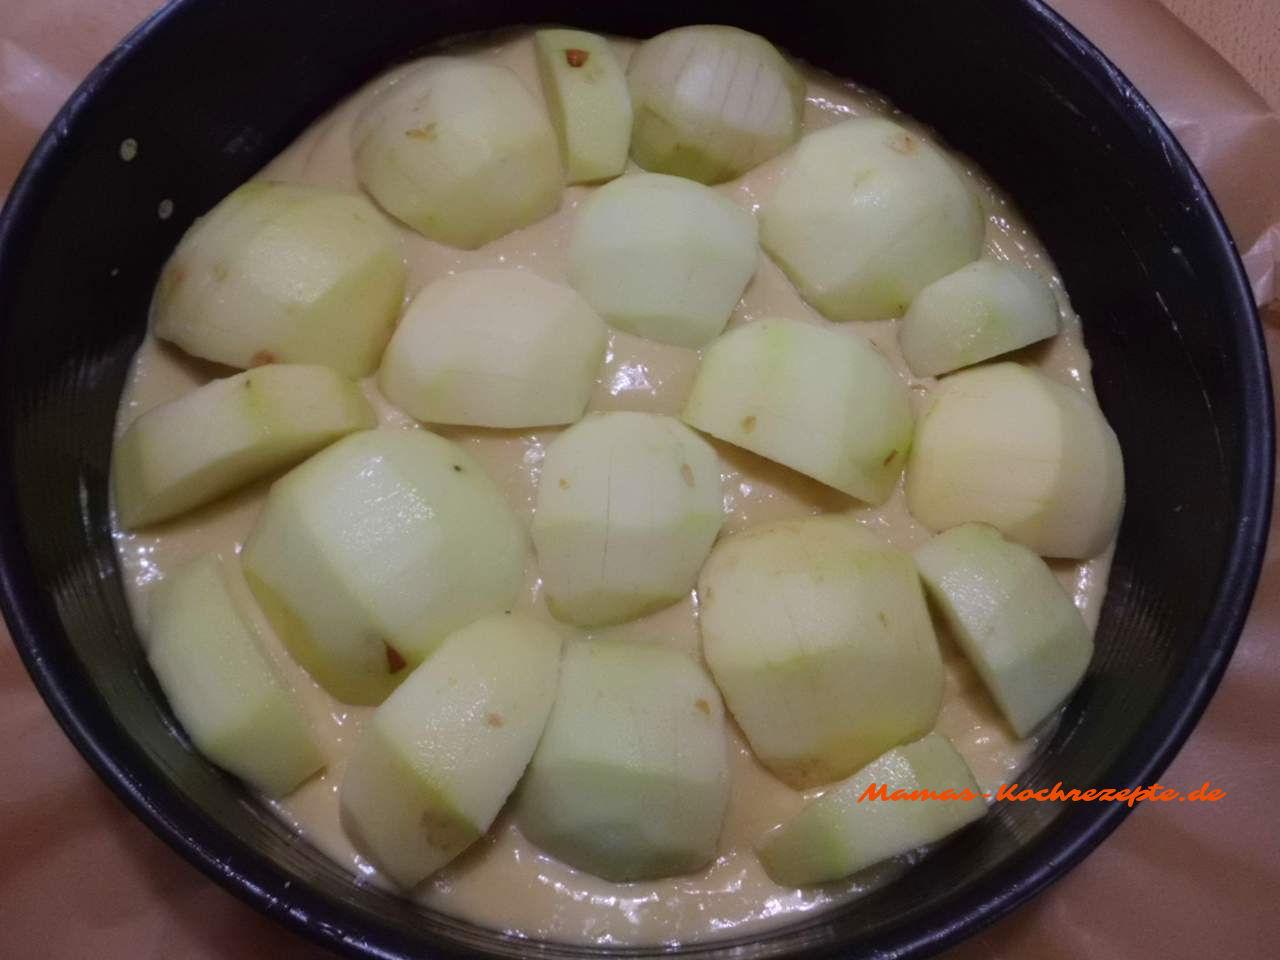 Apfelkuchen fertig zum Backen